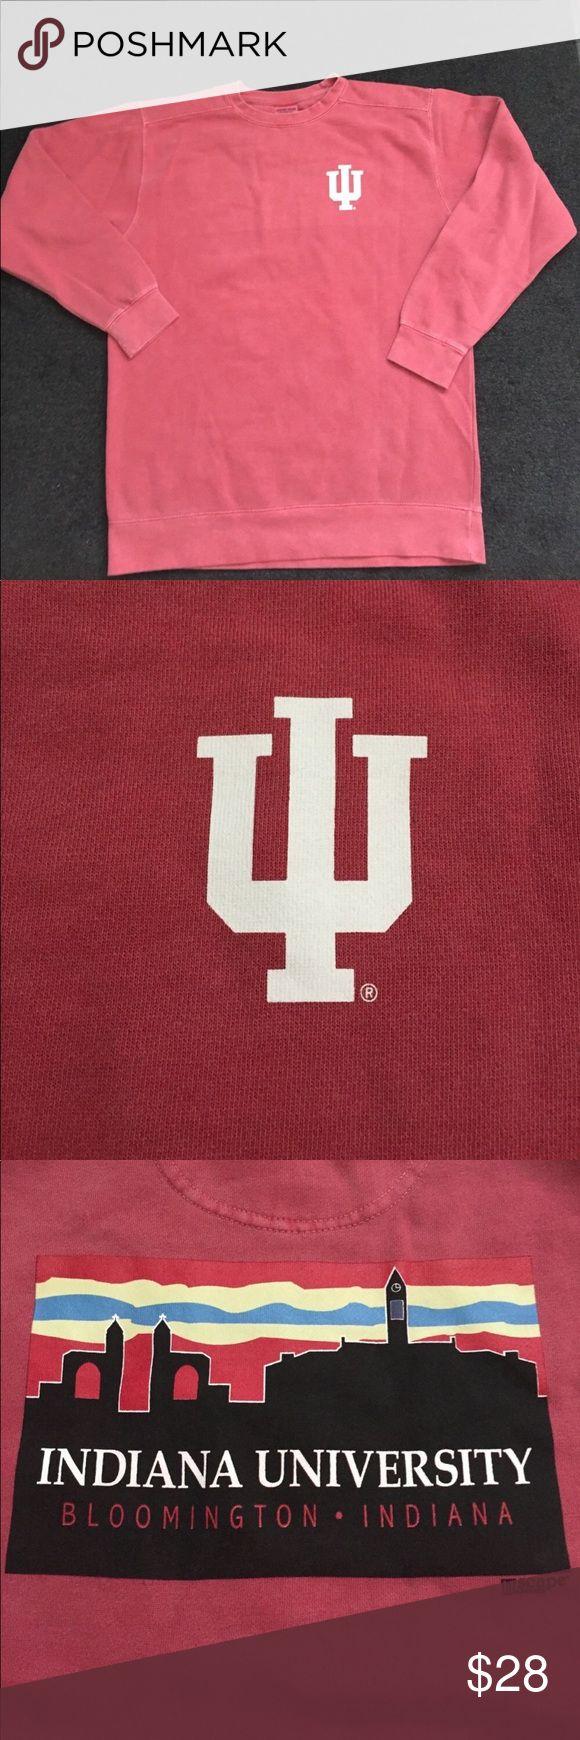 Indiana university bloomington mens sweatshirt